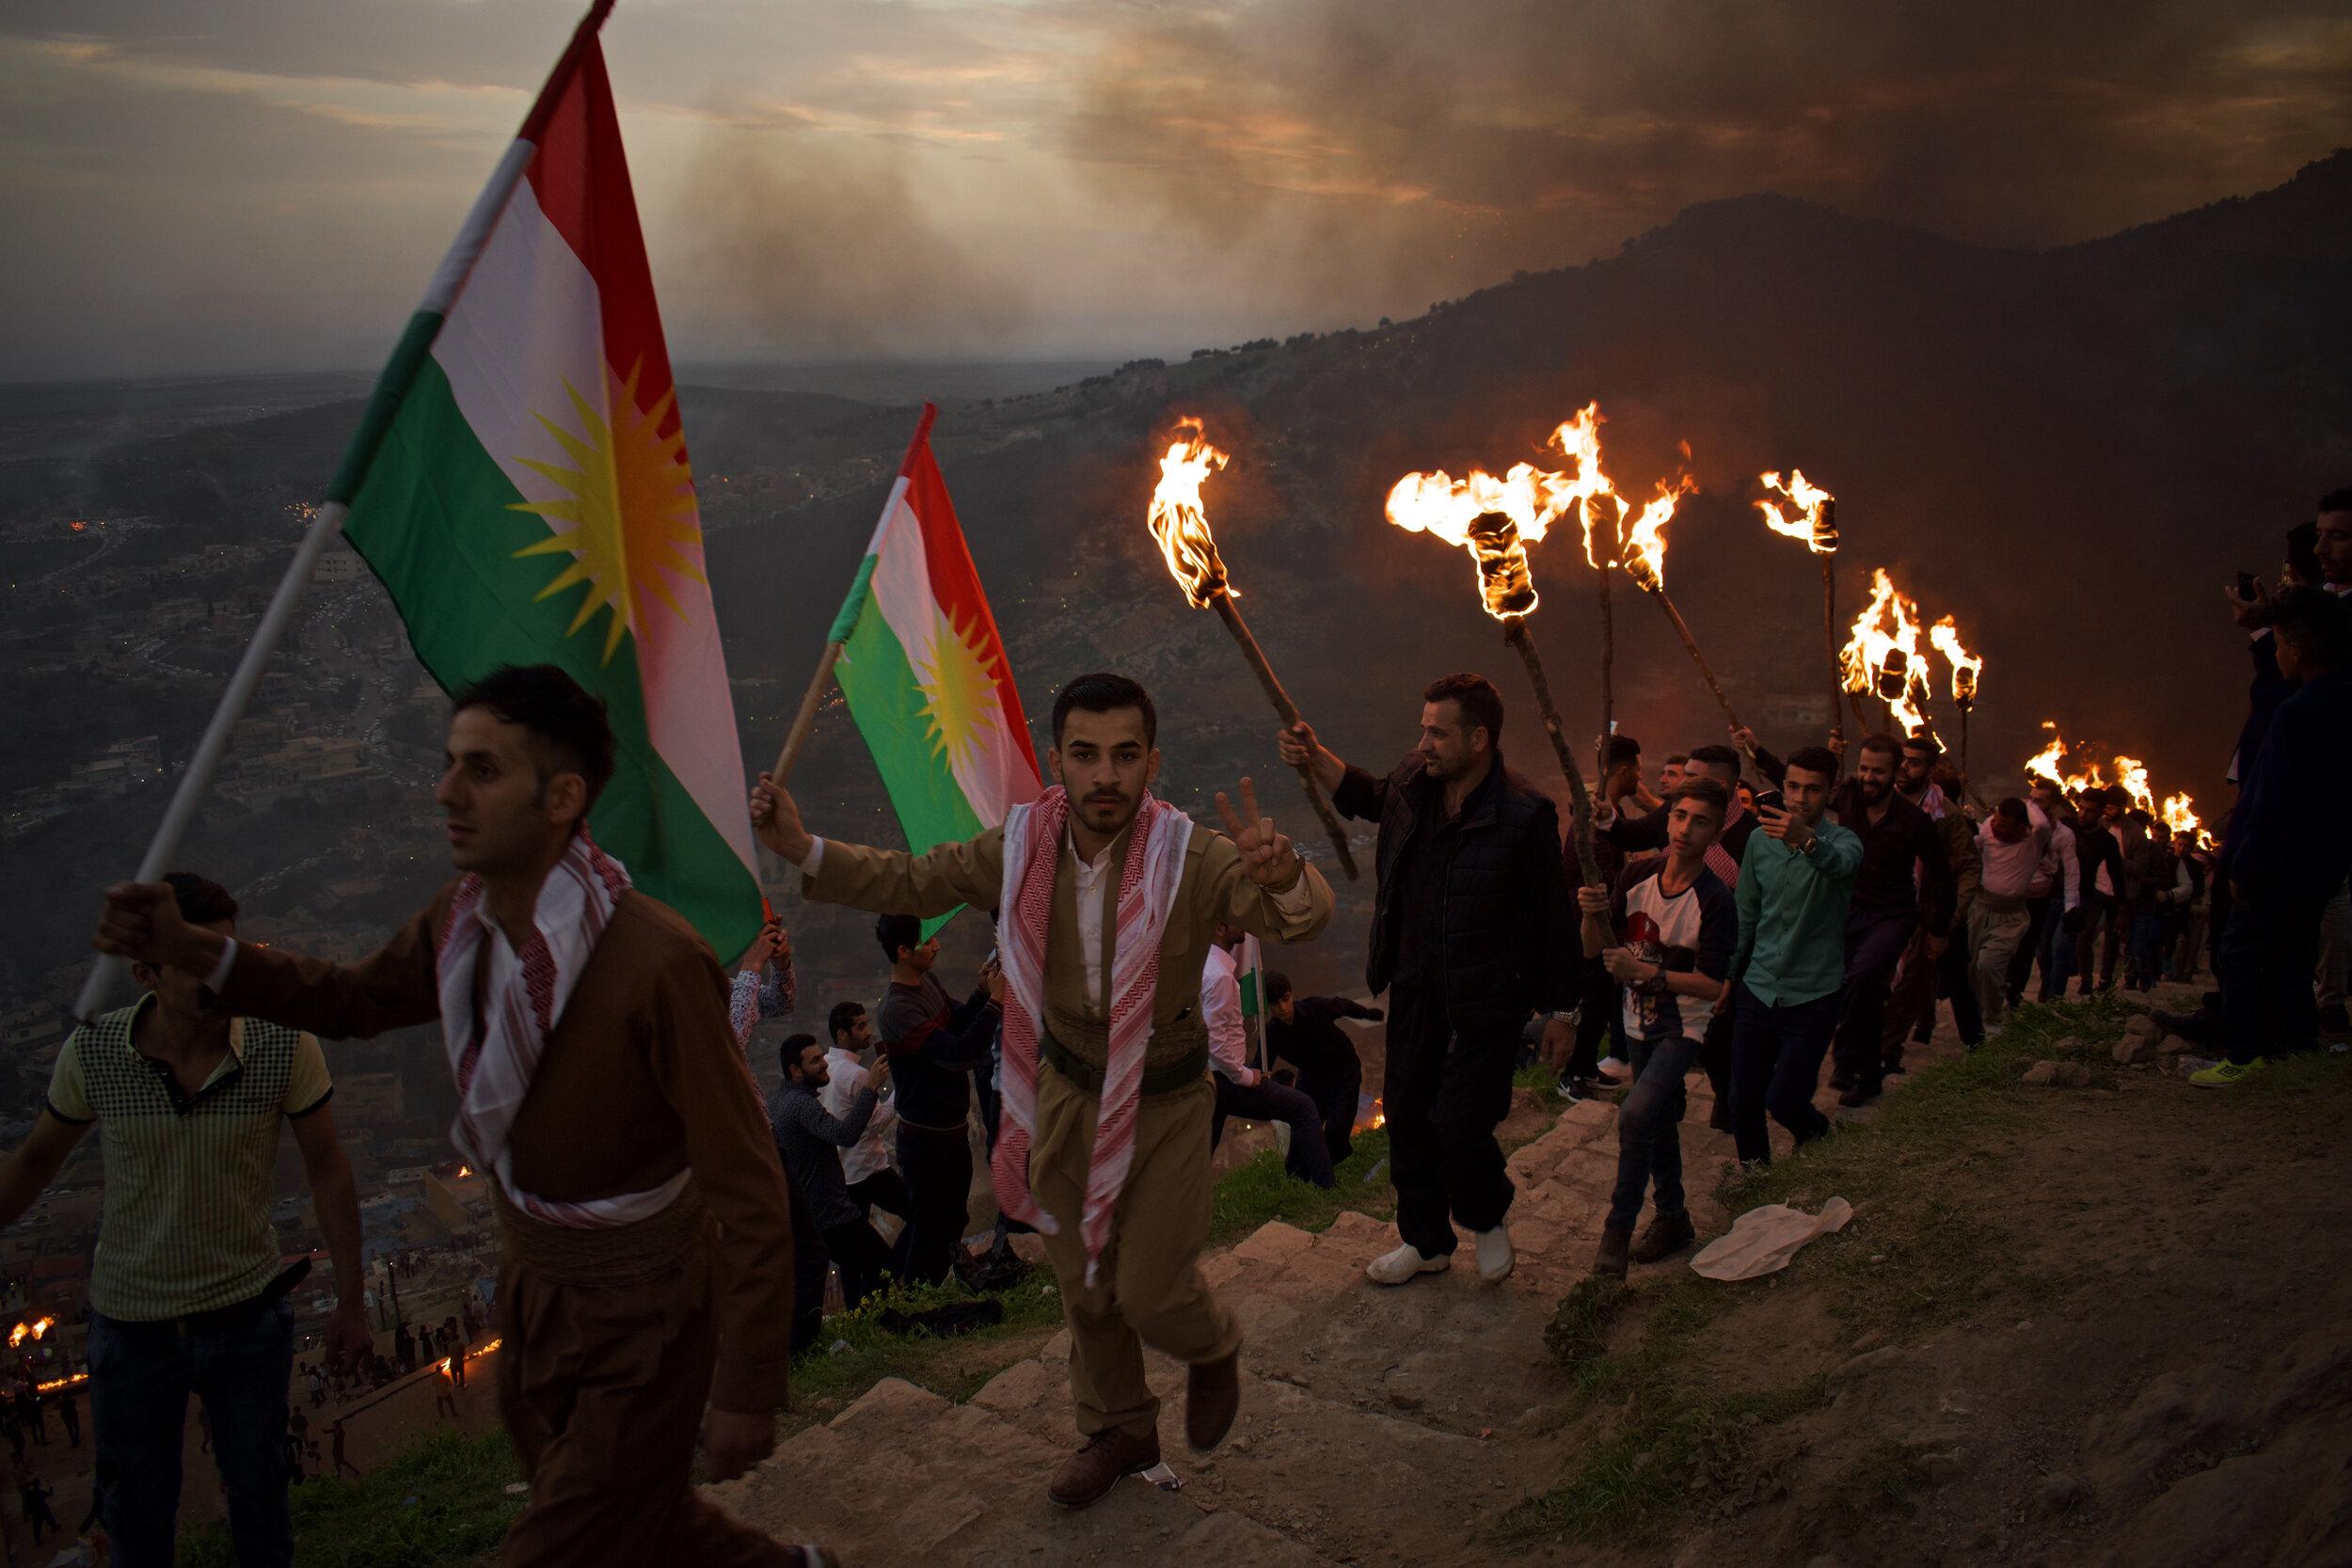 nowriuz-in-iraqi-kurdistan.jpg